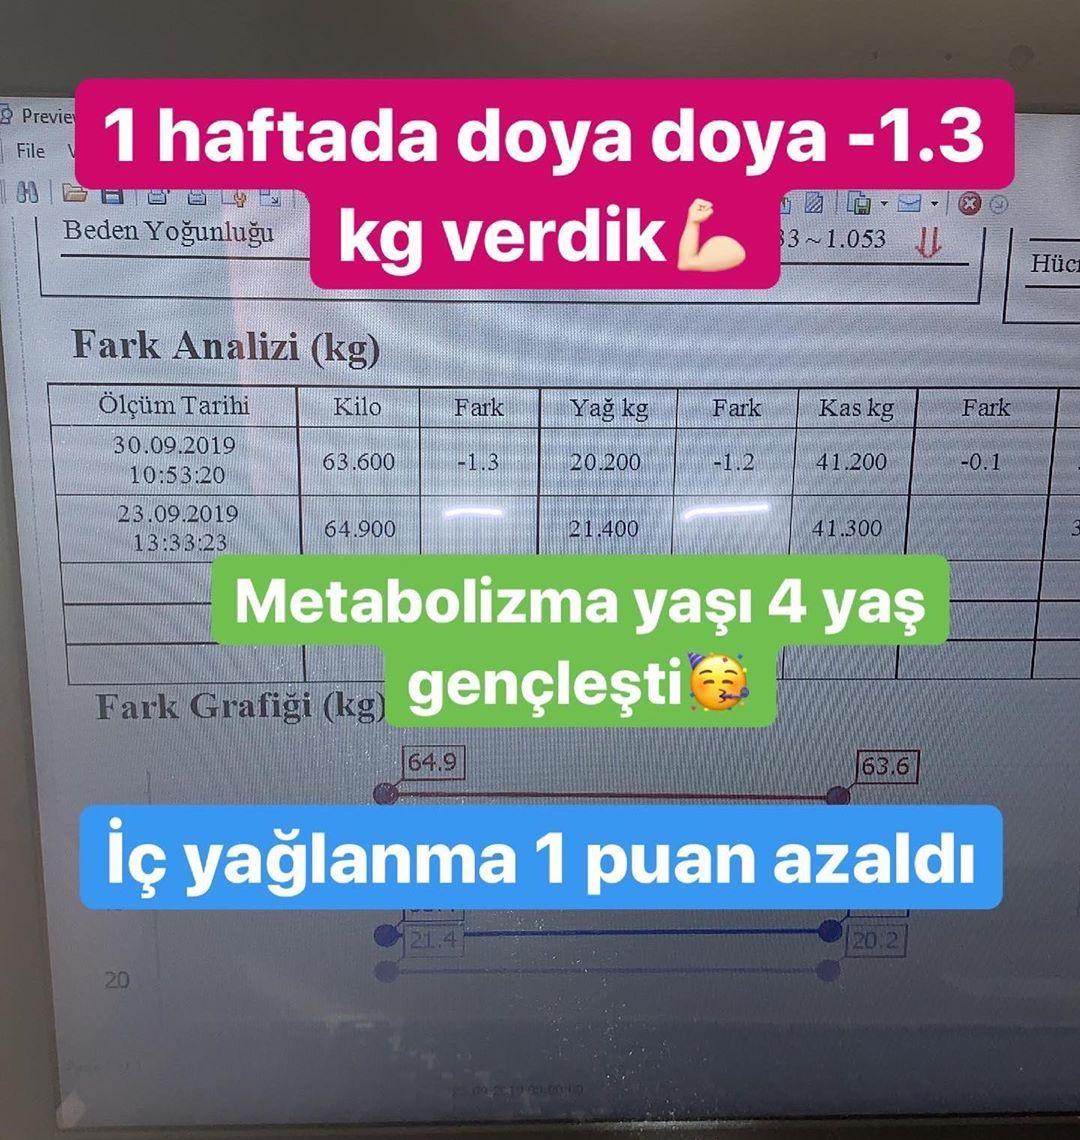 What Is Forex Detoks Metabolizma Ve Fitness